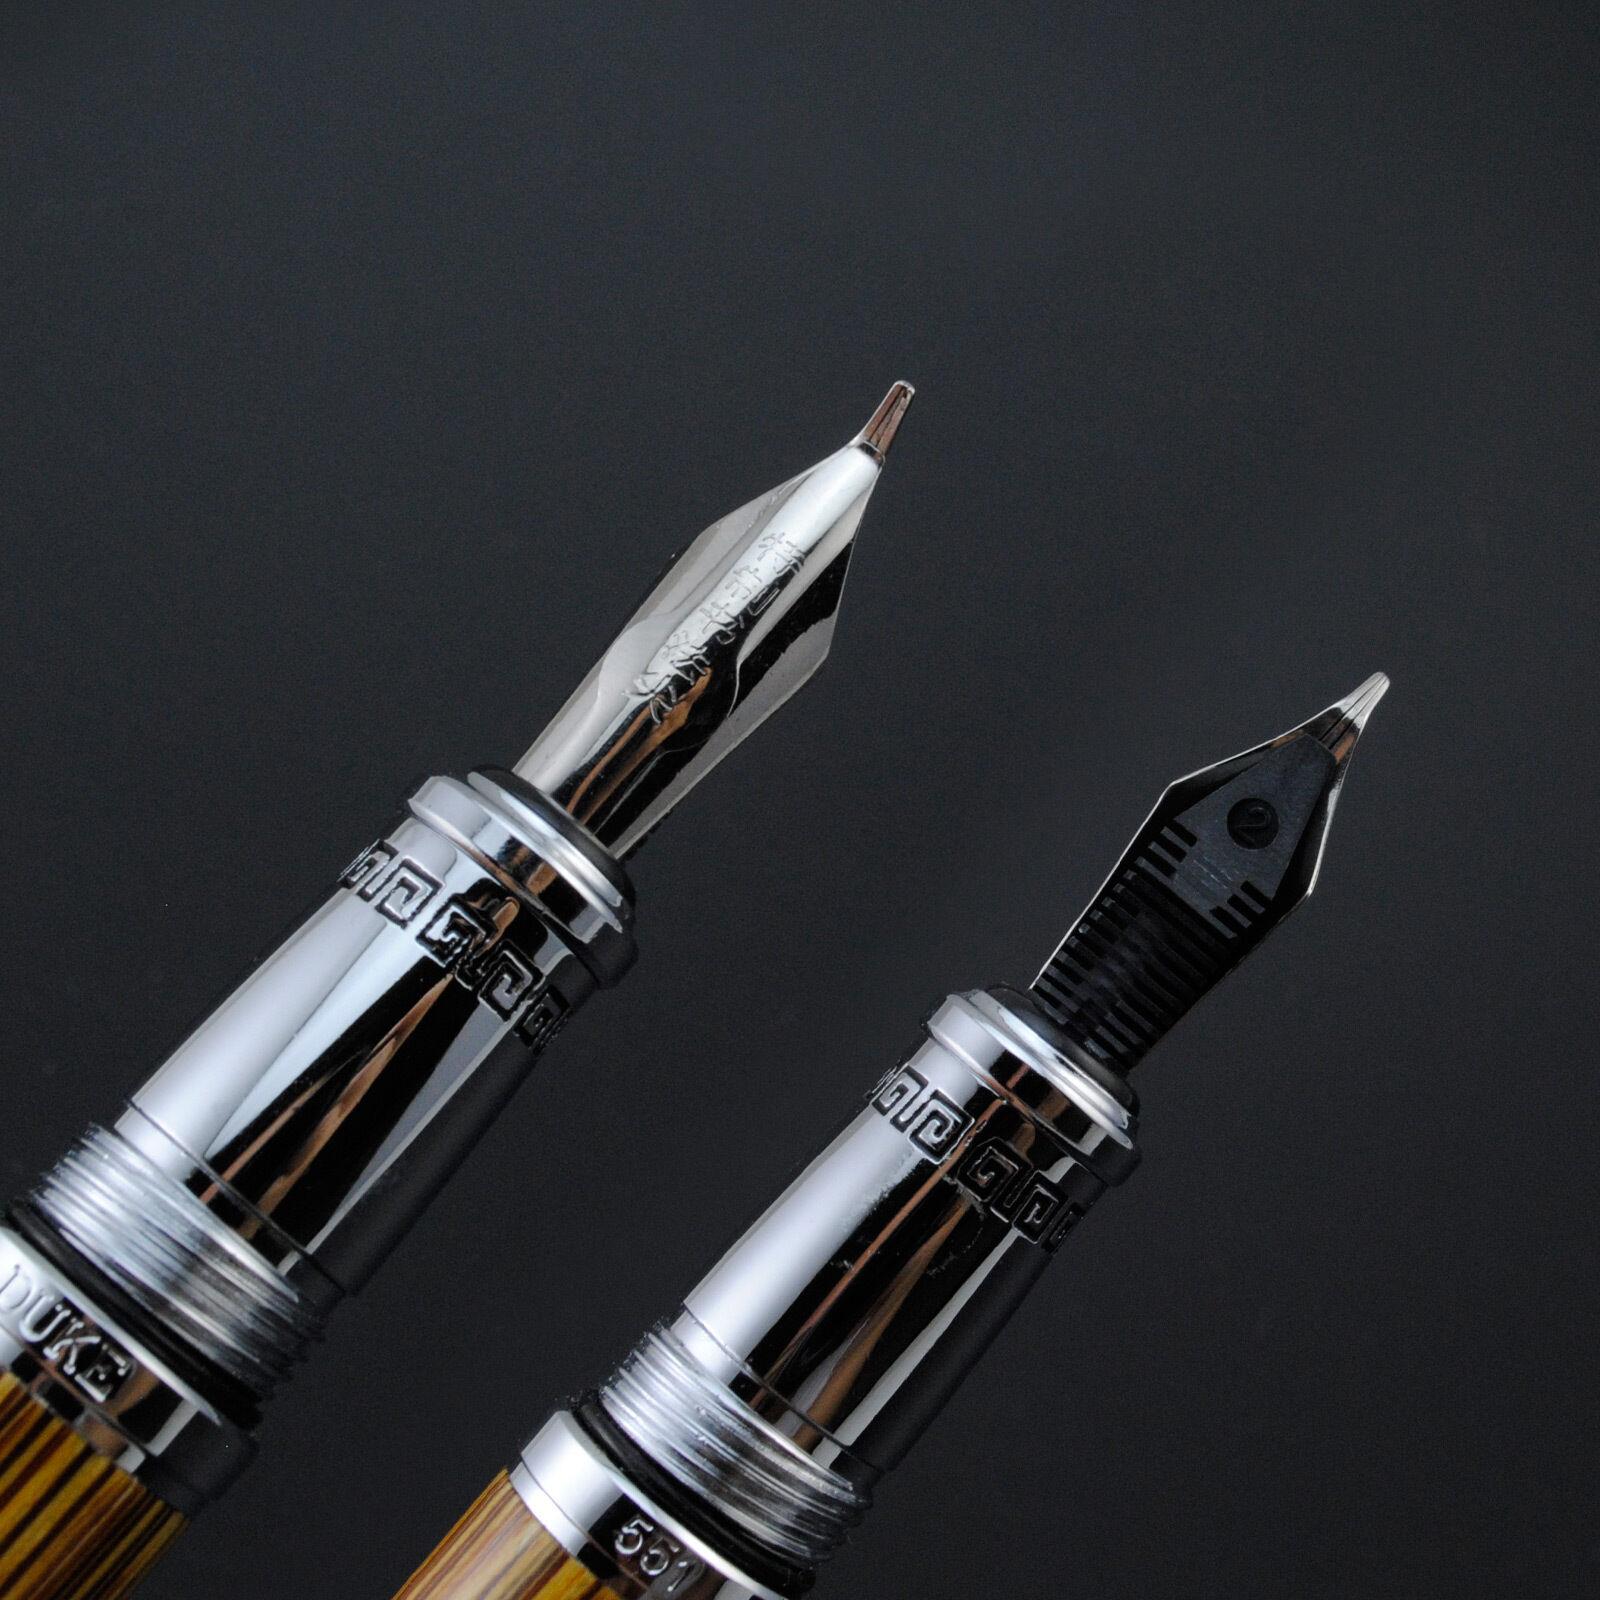 Duke Confucius Calligraphy Pen Screw Type Cap Without Box